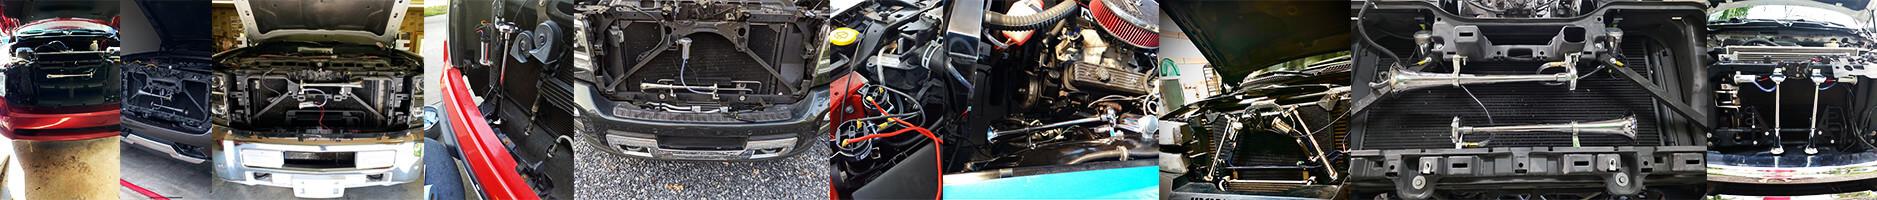 MotoHorn Vehicle Installations